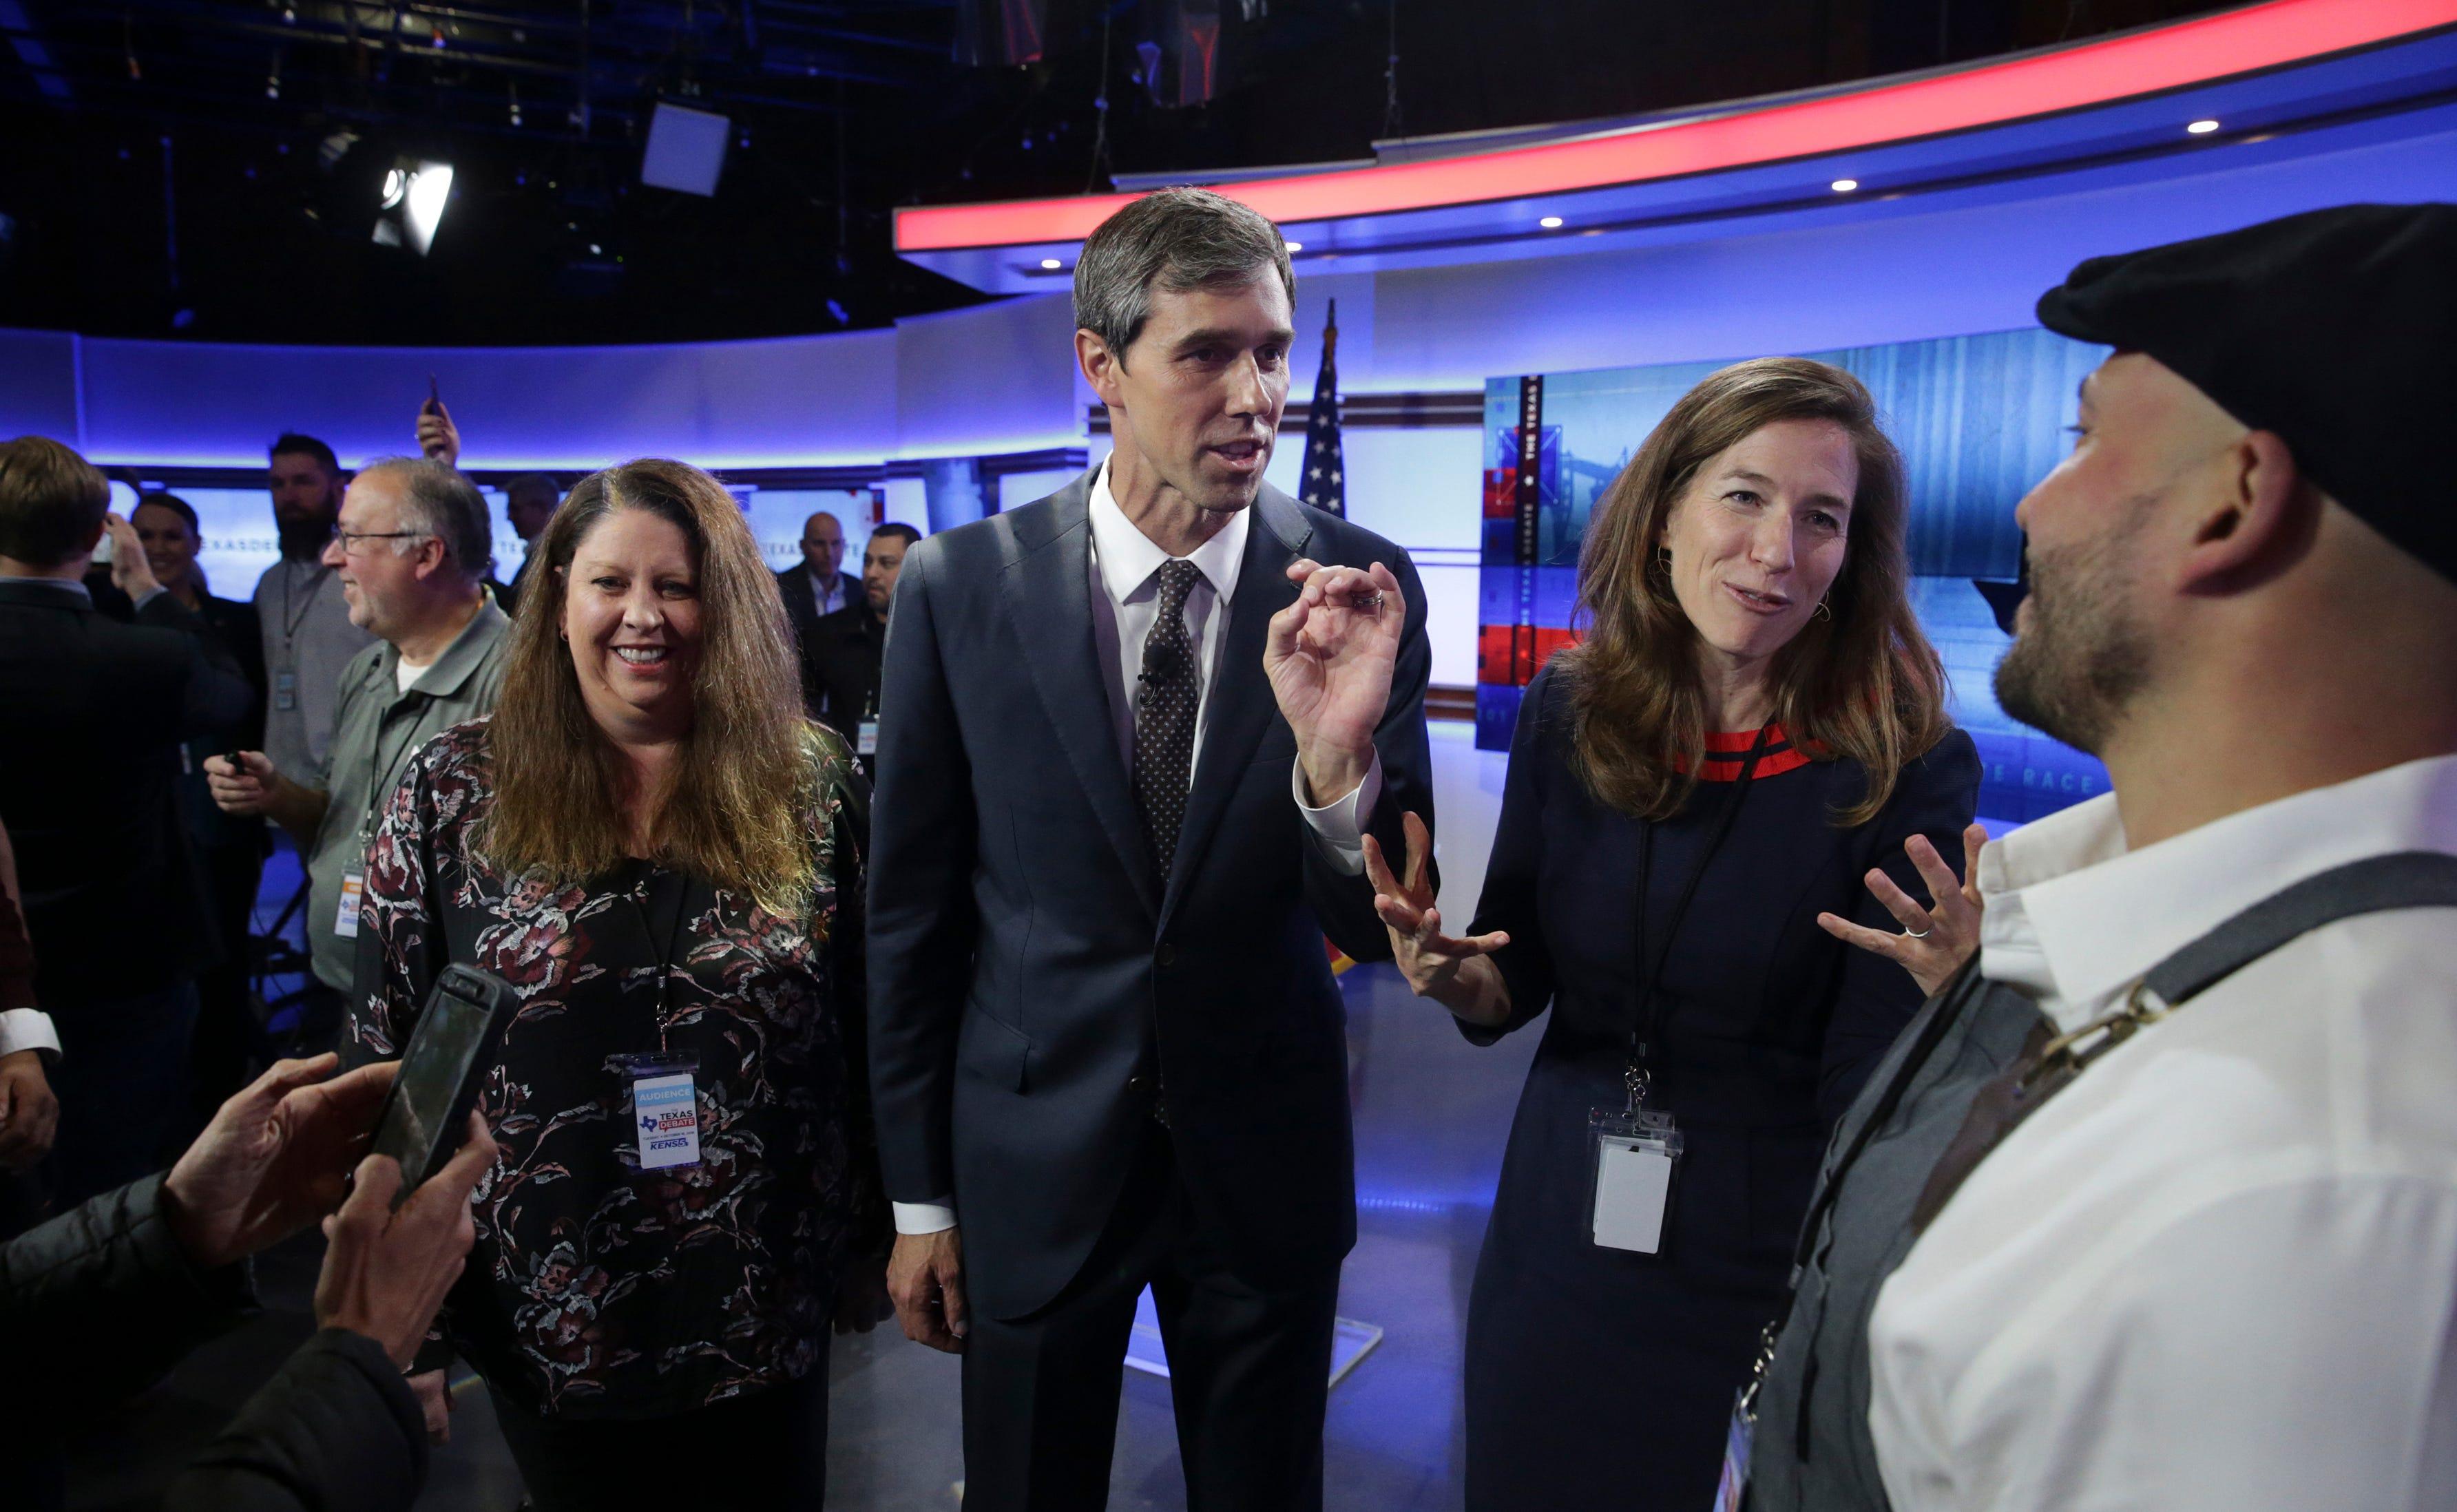 President Donald Trump calls Beto O'Rourke a 'flake' after Ted Cruz, O'Rourke debate | El Paso Times